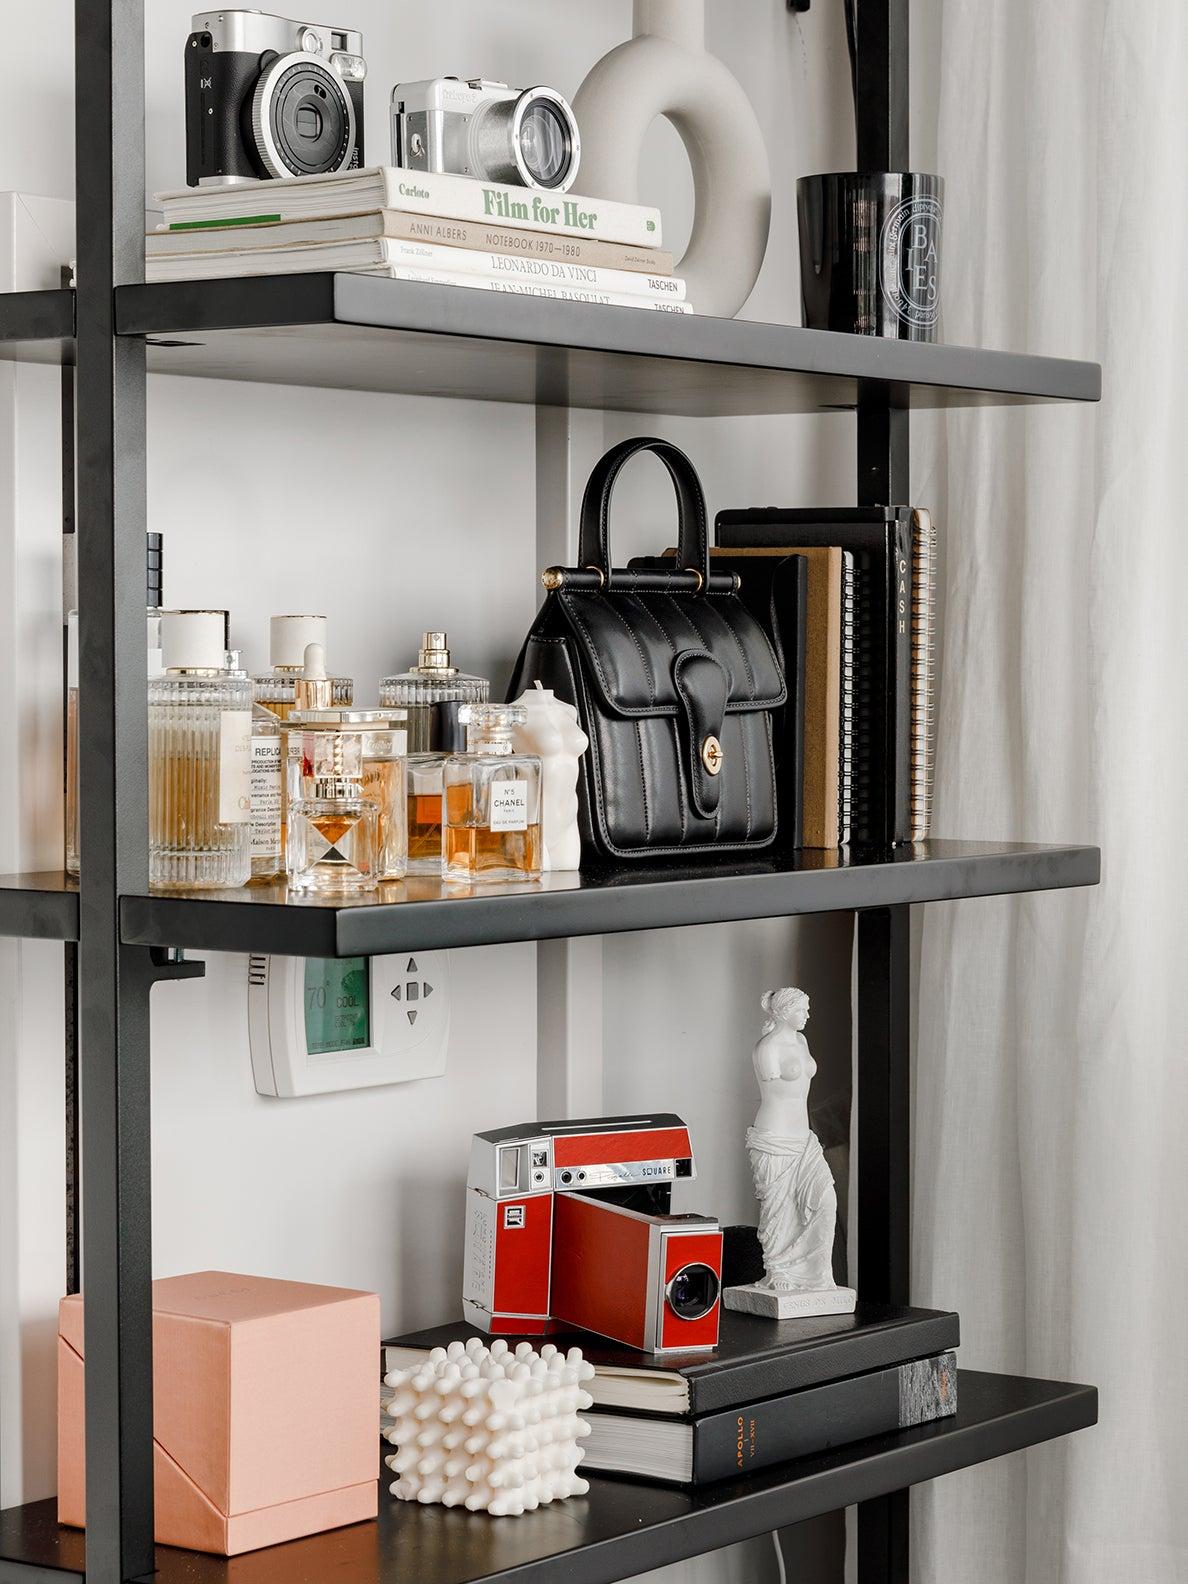 perfume on open shelves